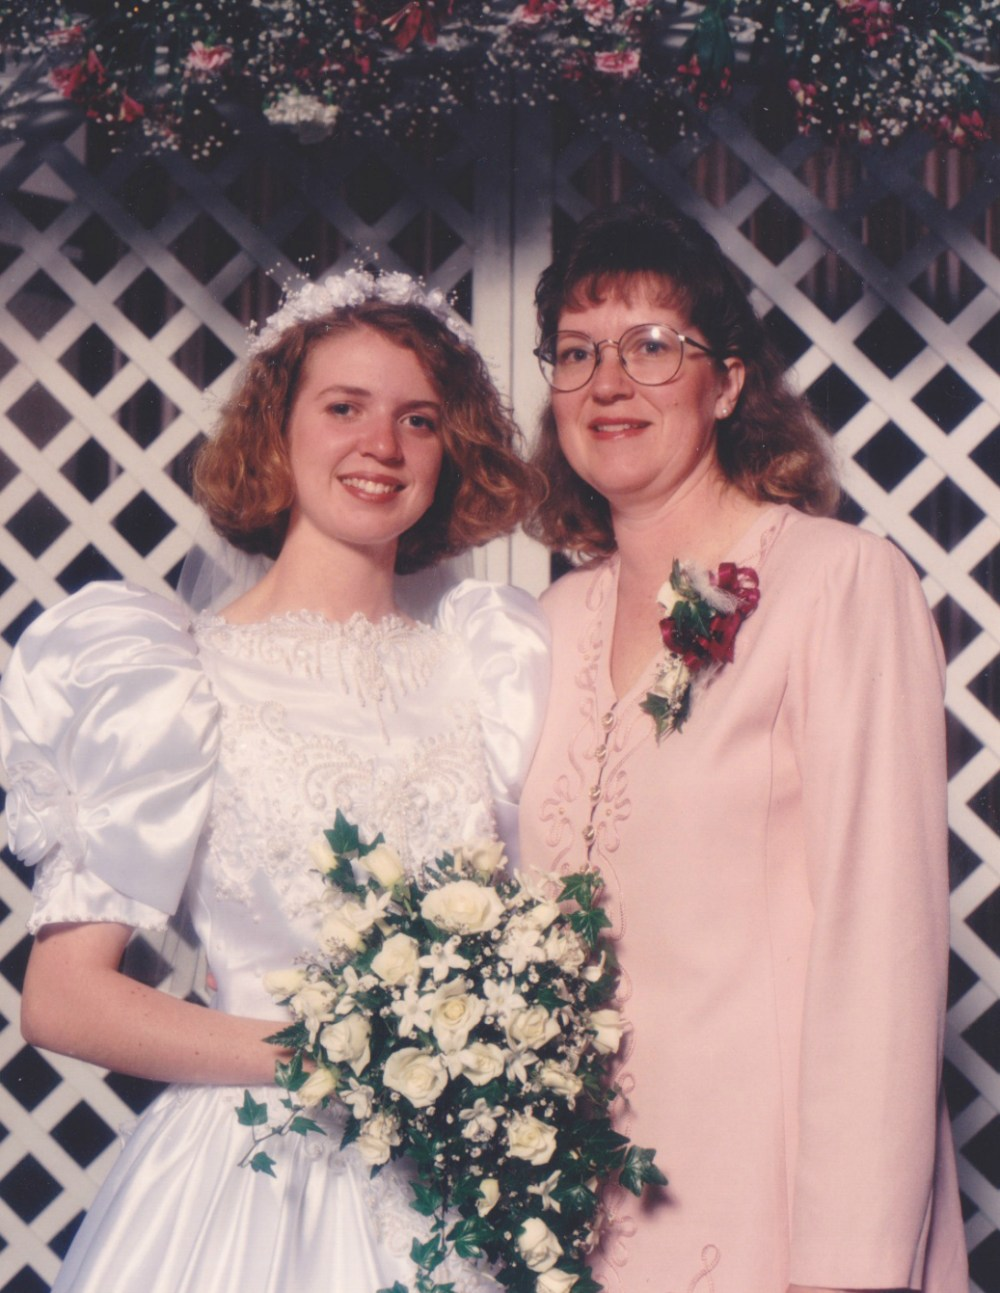 Laura and Mom at wedding